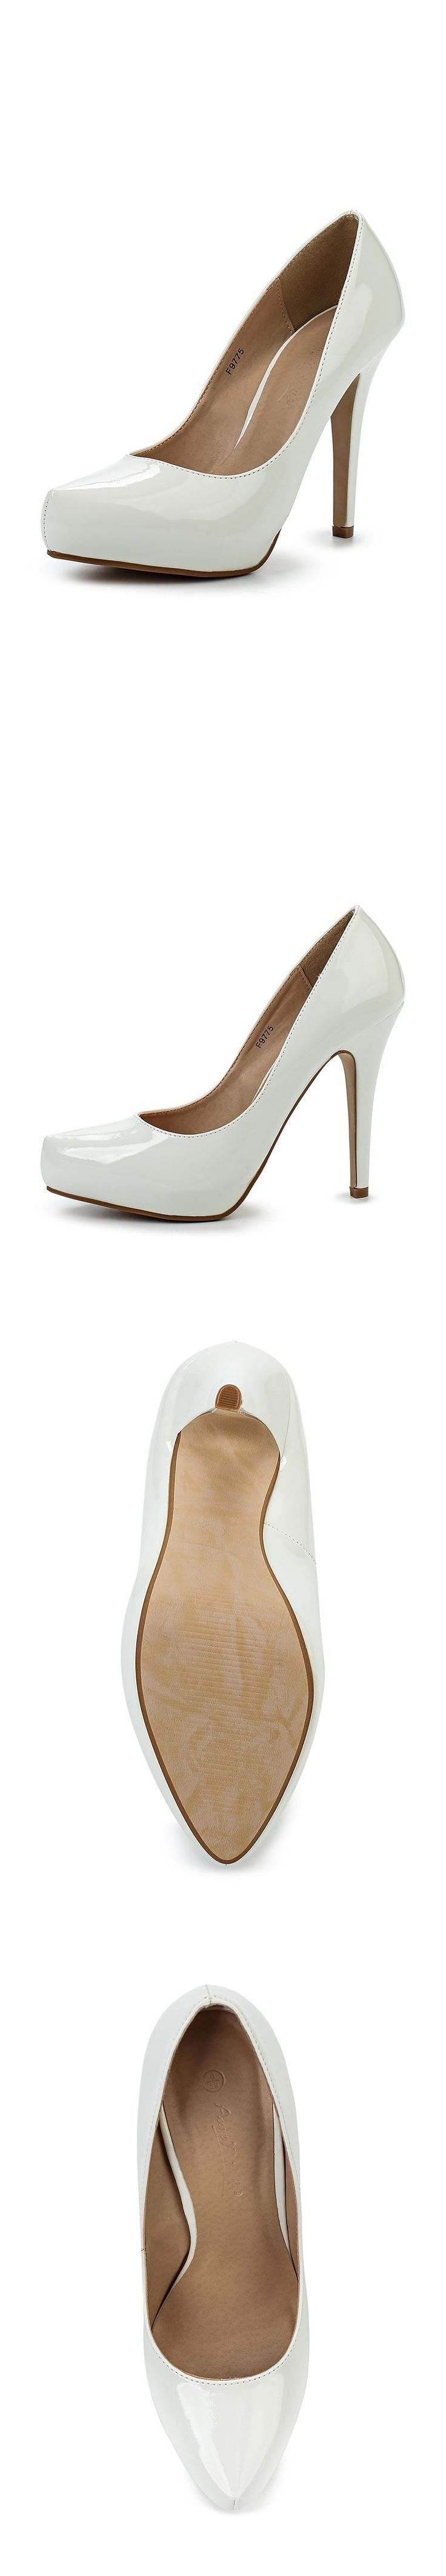 Женская обувь туфли Anne Michelle за 3899.00 руб.